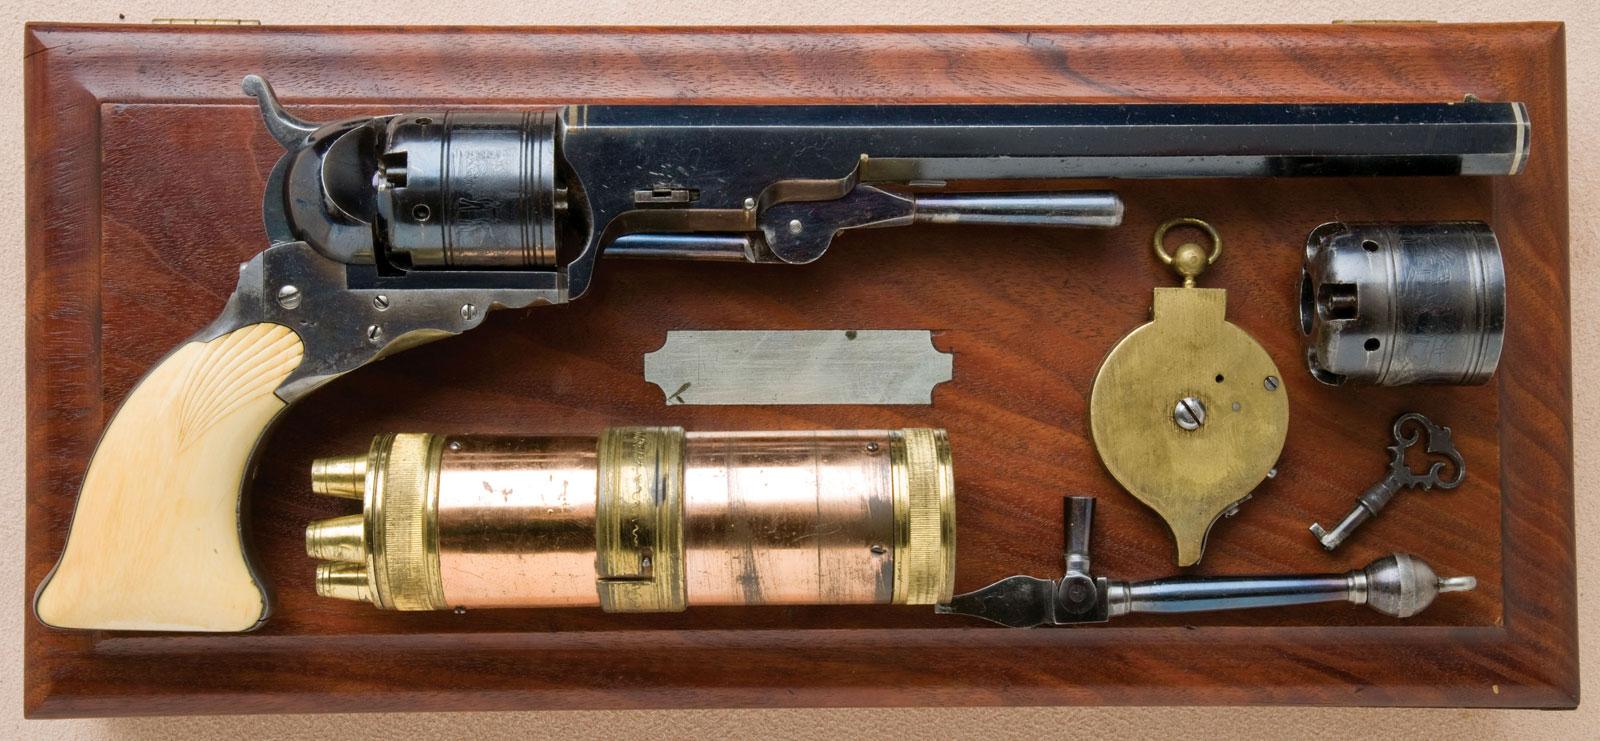 Extremely Rare Colt 1st Generation Buntline Revolver (C13534)